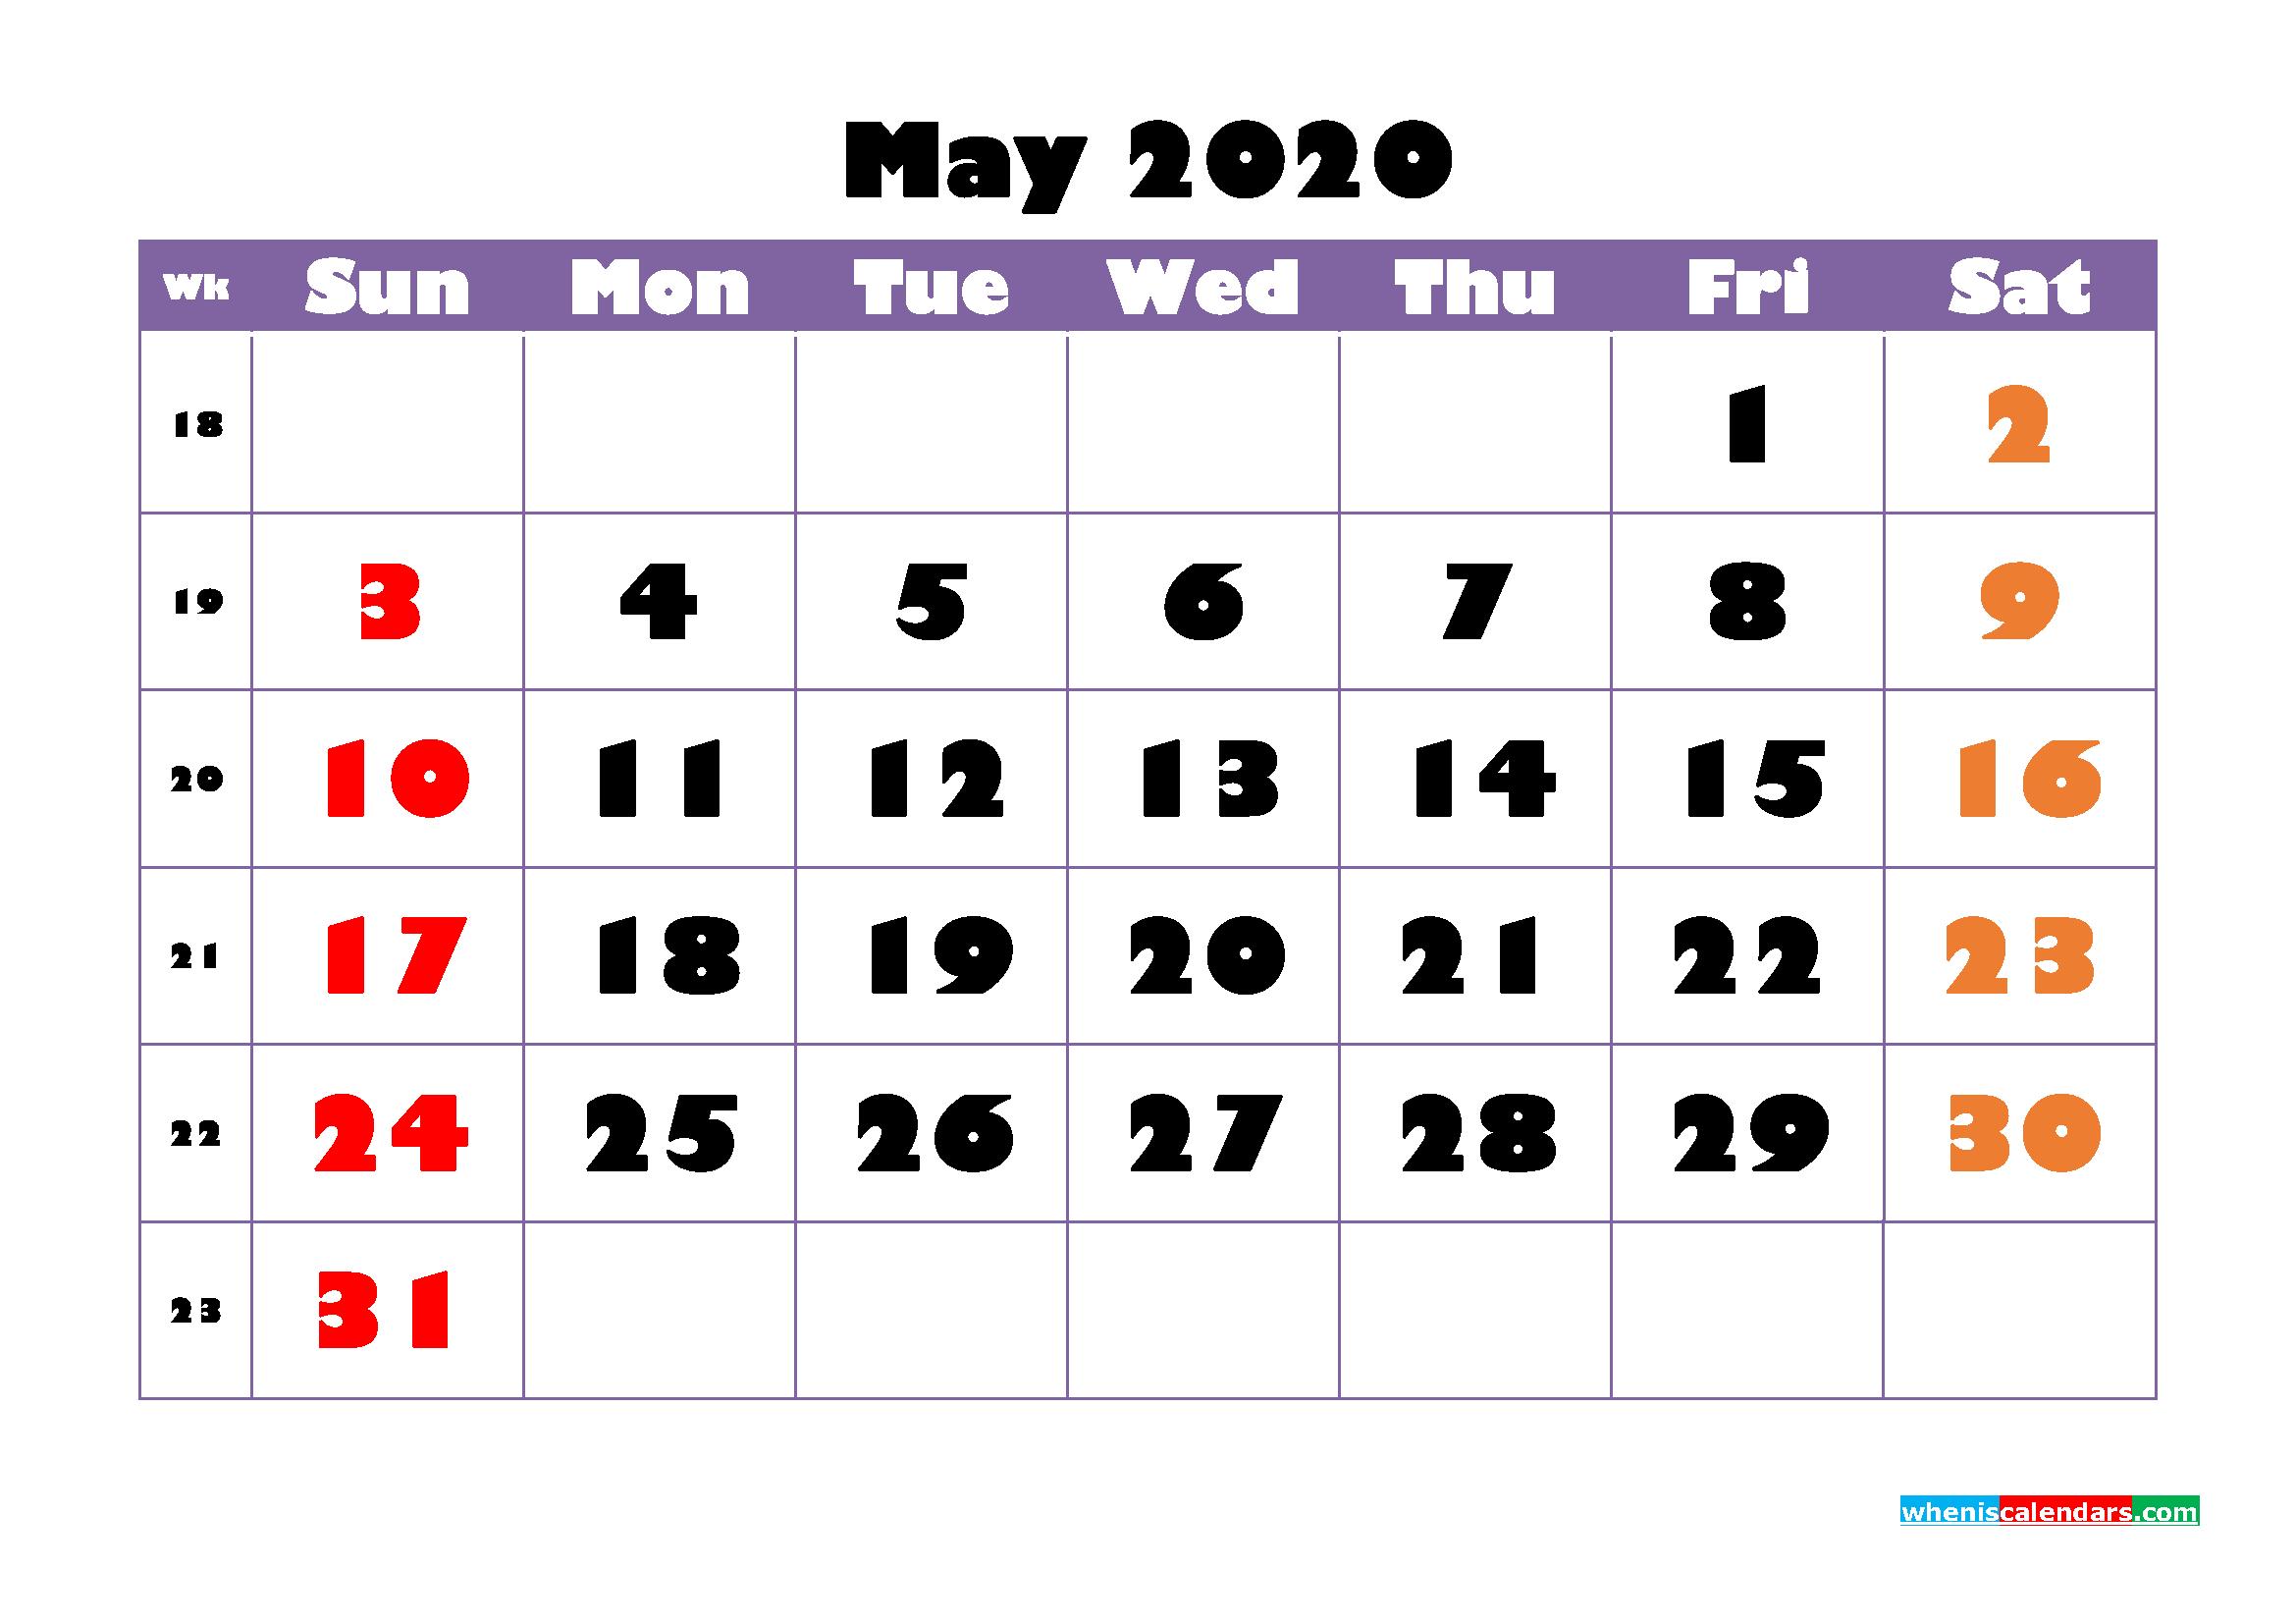 Free Printable May 2020 Calendar - No.m20b749